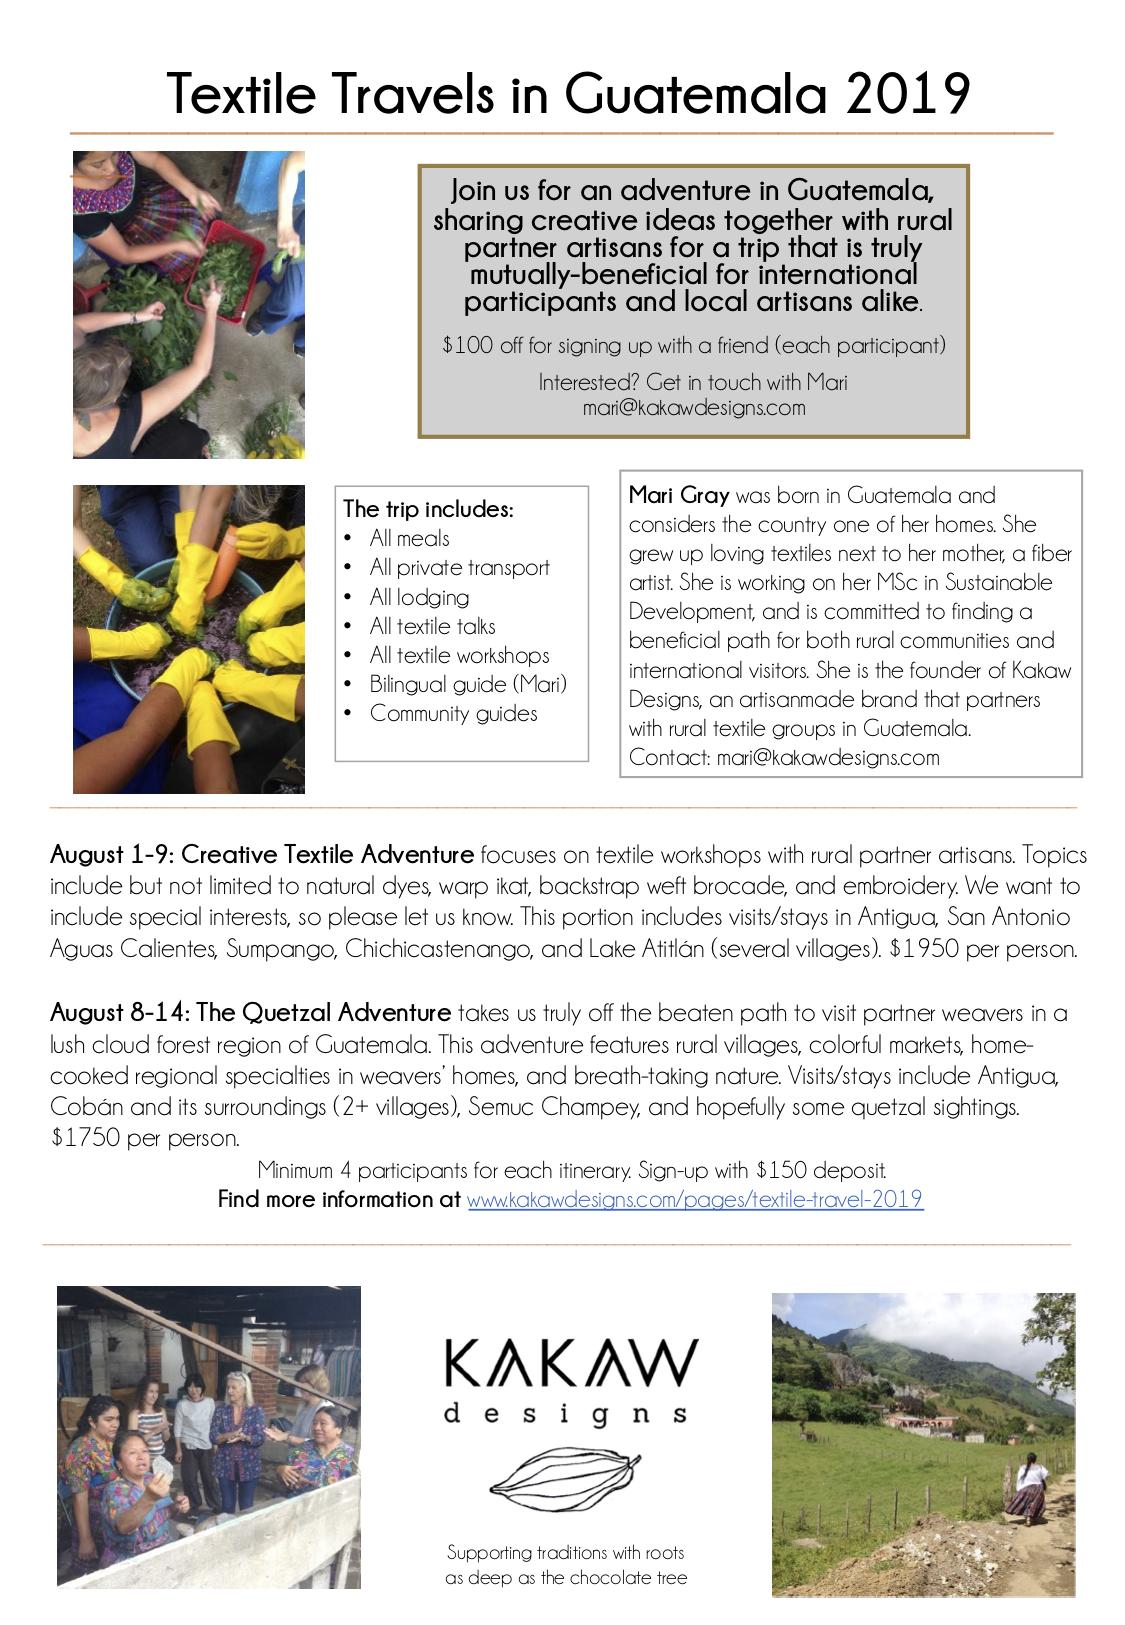 Textile Travels Guatemala 2019 info